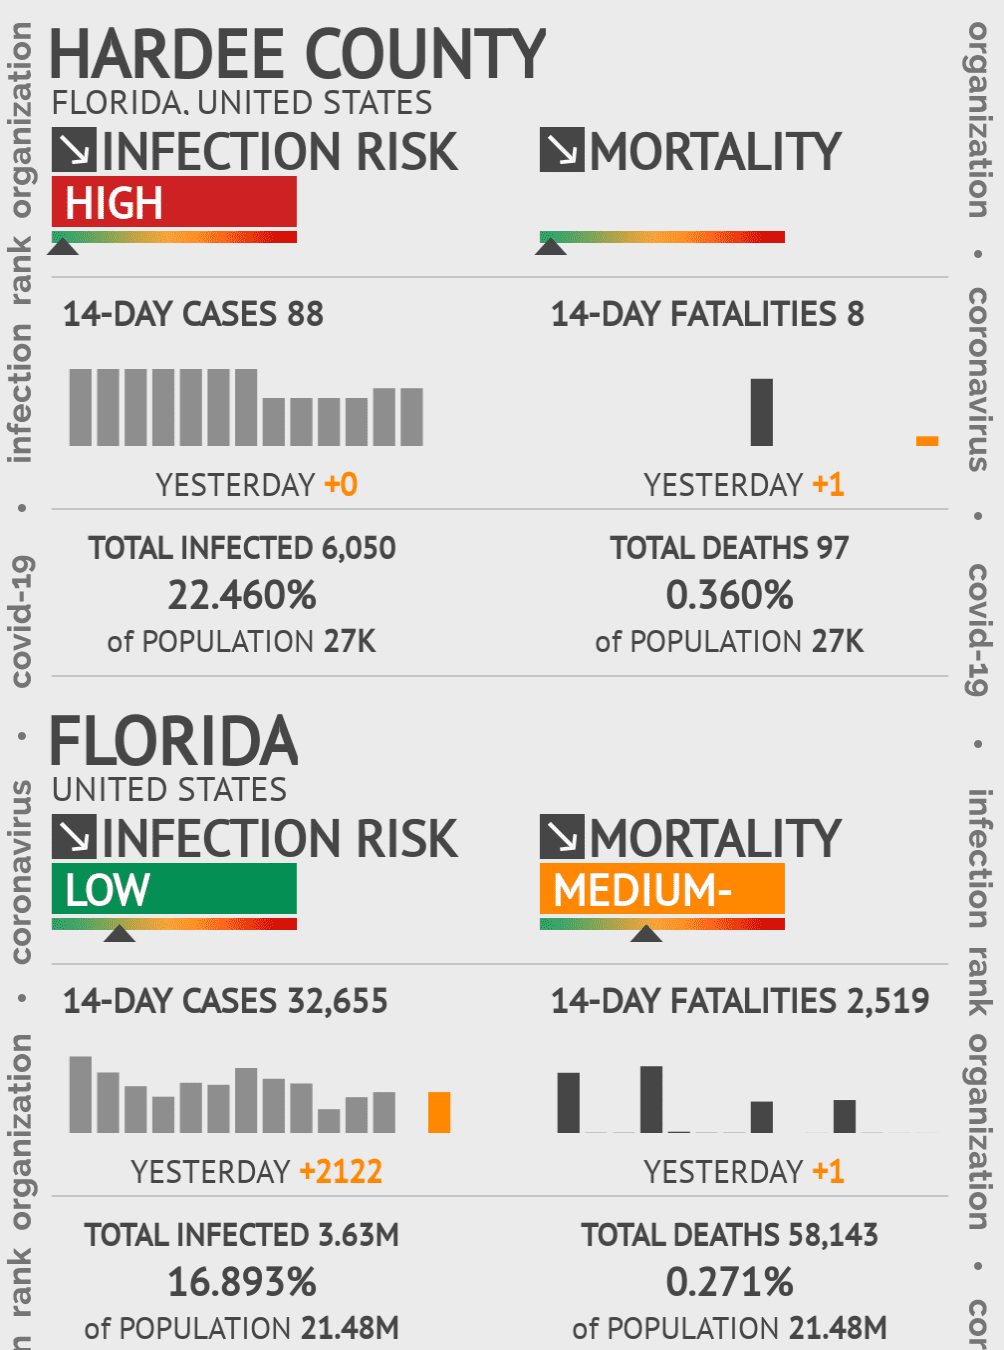 Hardee County Coronavirus Covid-19 Risk of Infection on October 16, 2020